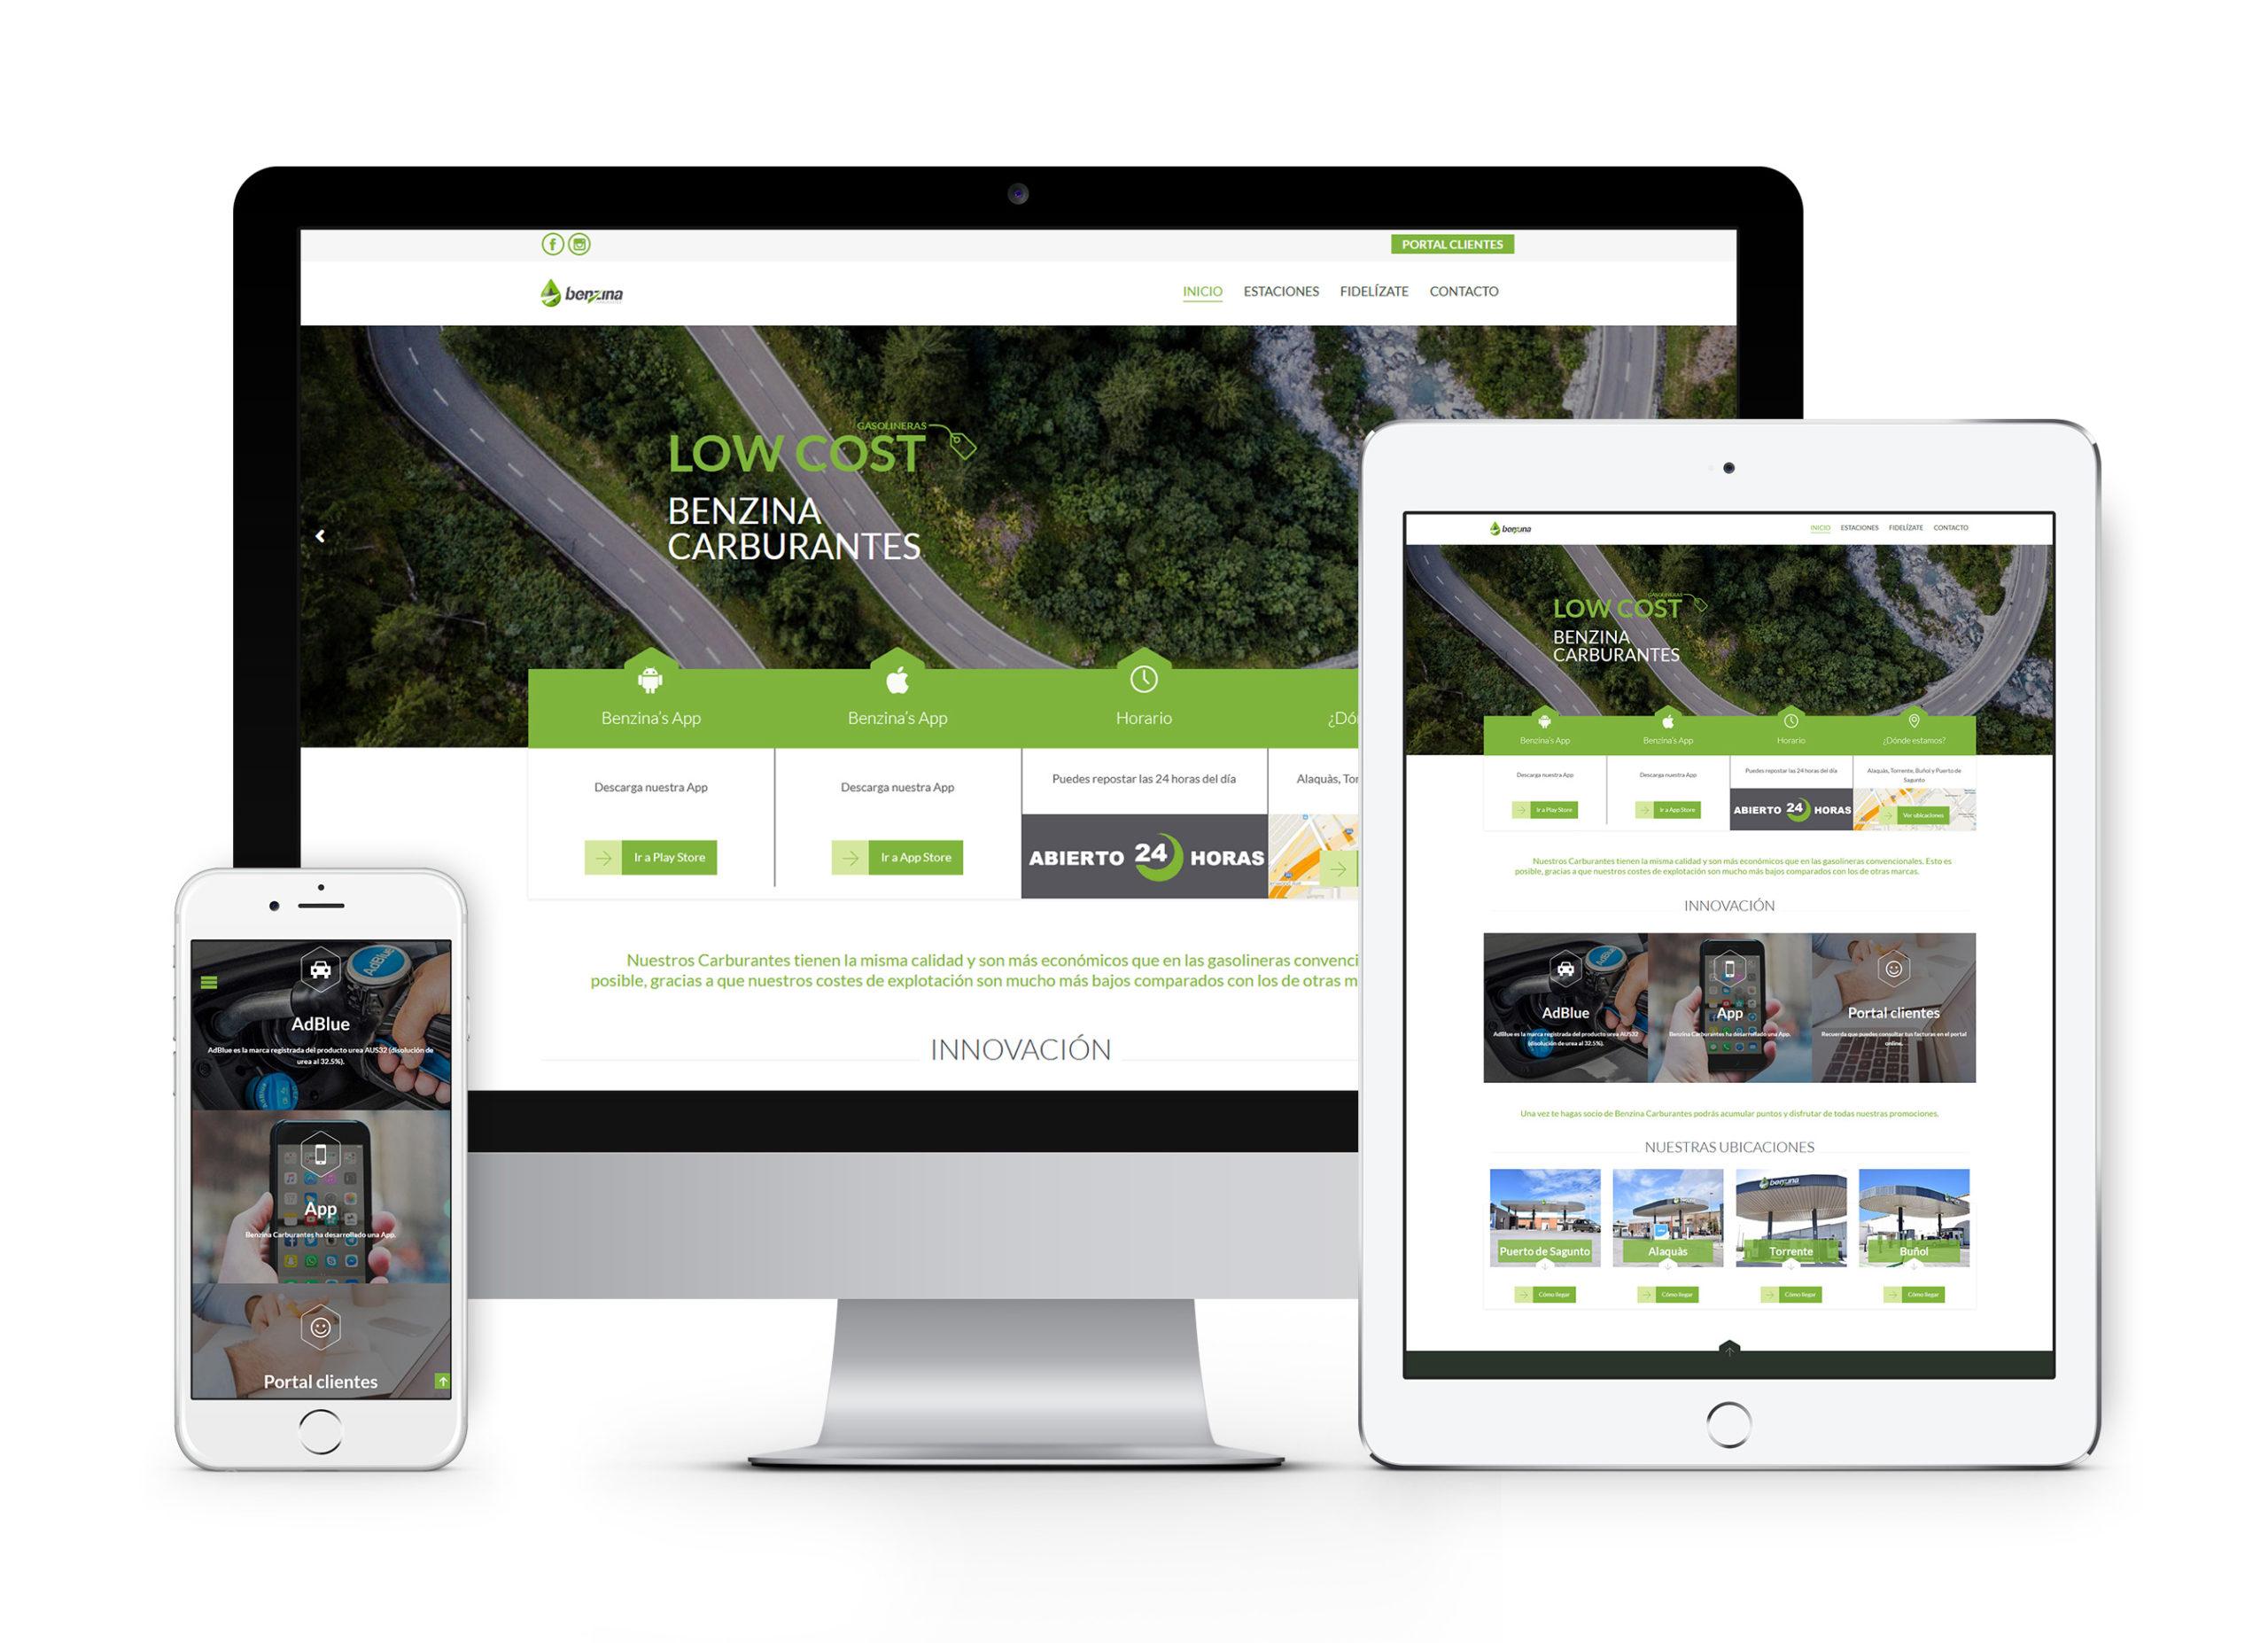 Benzina Carburantes - Diseño web